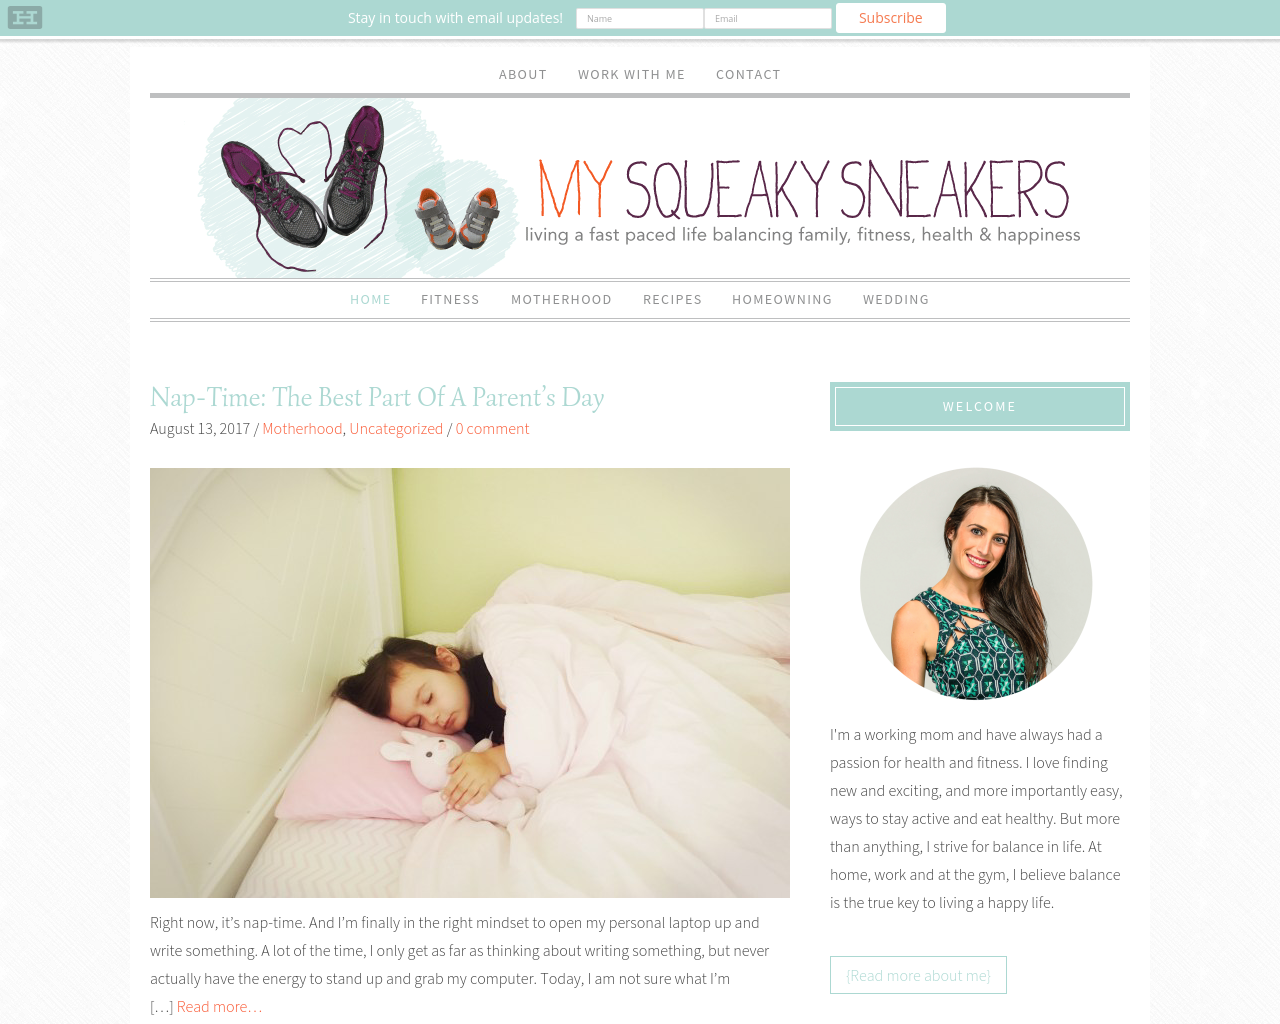 My-Squeaky-Sneakers-Advertising-Reviews-Pricing